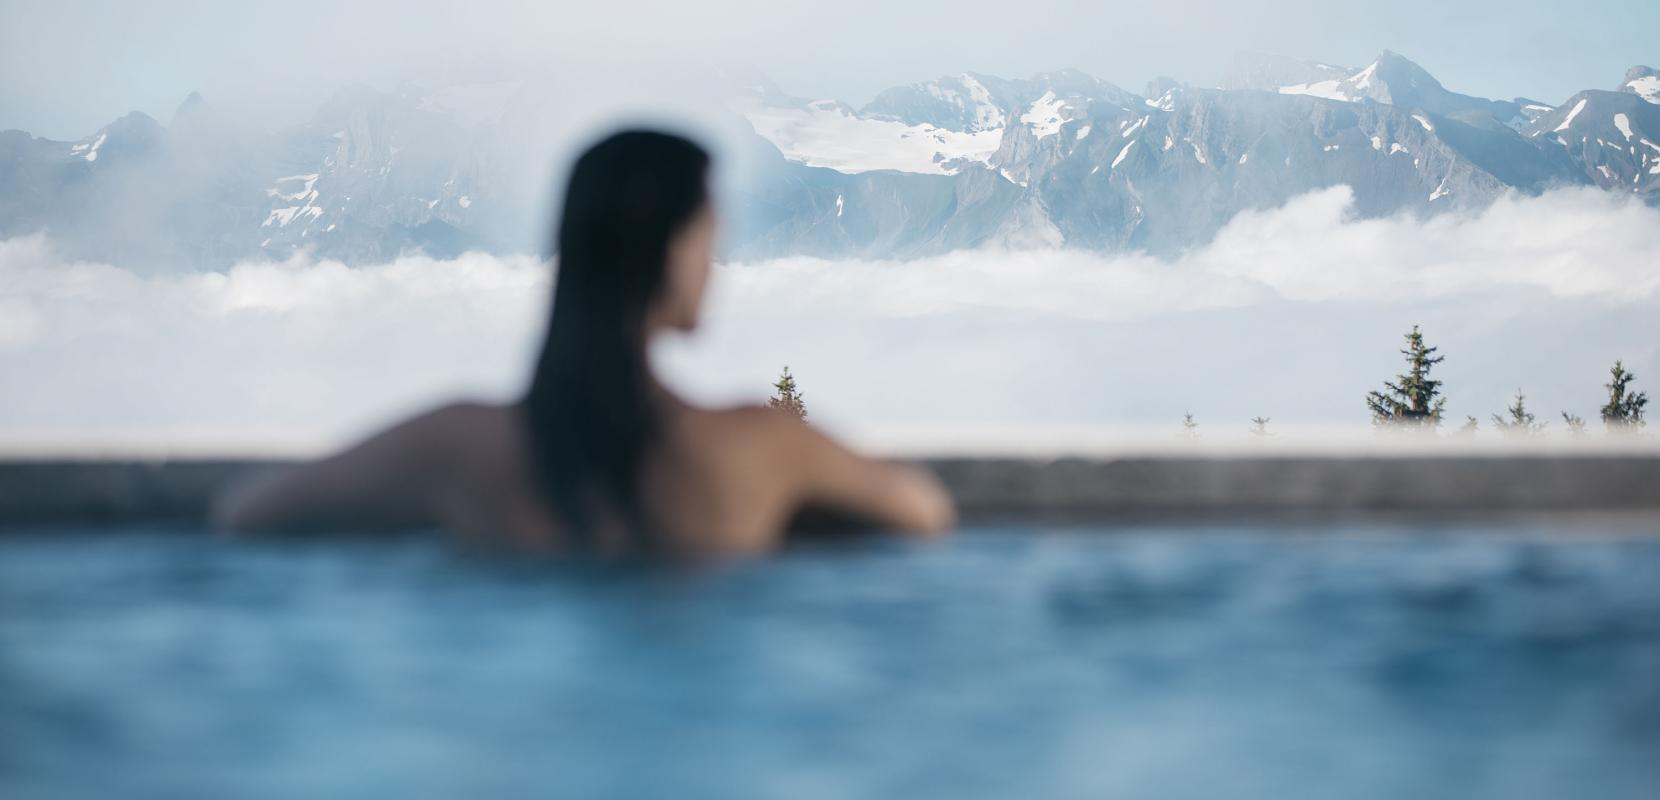 https://www.aqua-spa-resorts.ch/sites/default/files/styles/image_large_desktop/public/2020-09/mineralbad-spa-rigi-kaltbad-dayspa-morgenerwachen.jpg?h=c6980913&itok=Dy6YfQMS